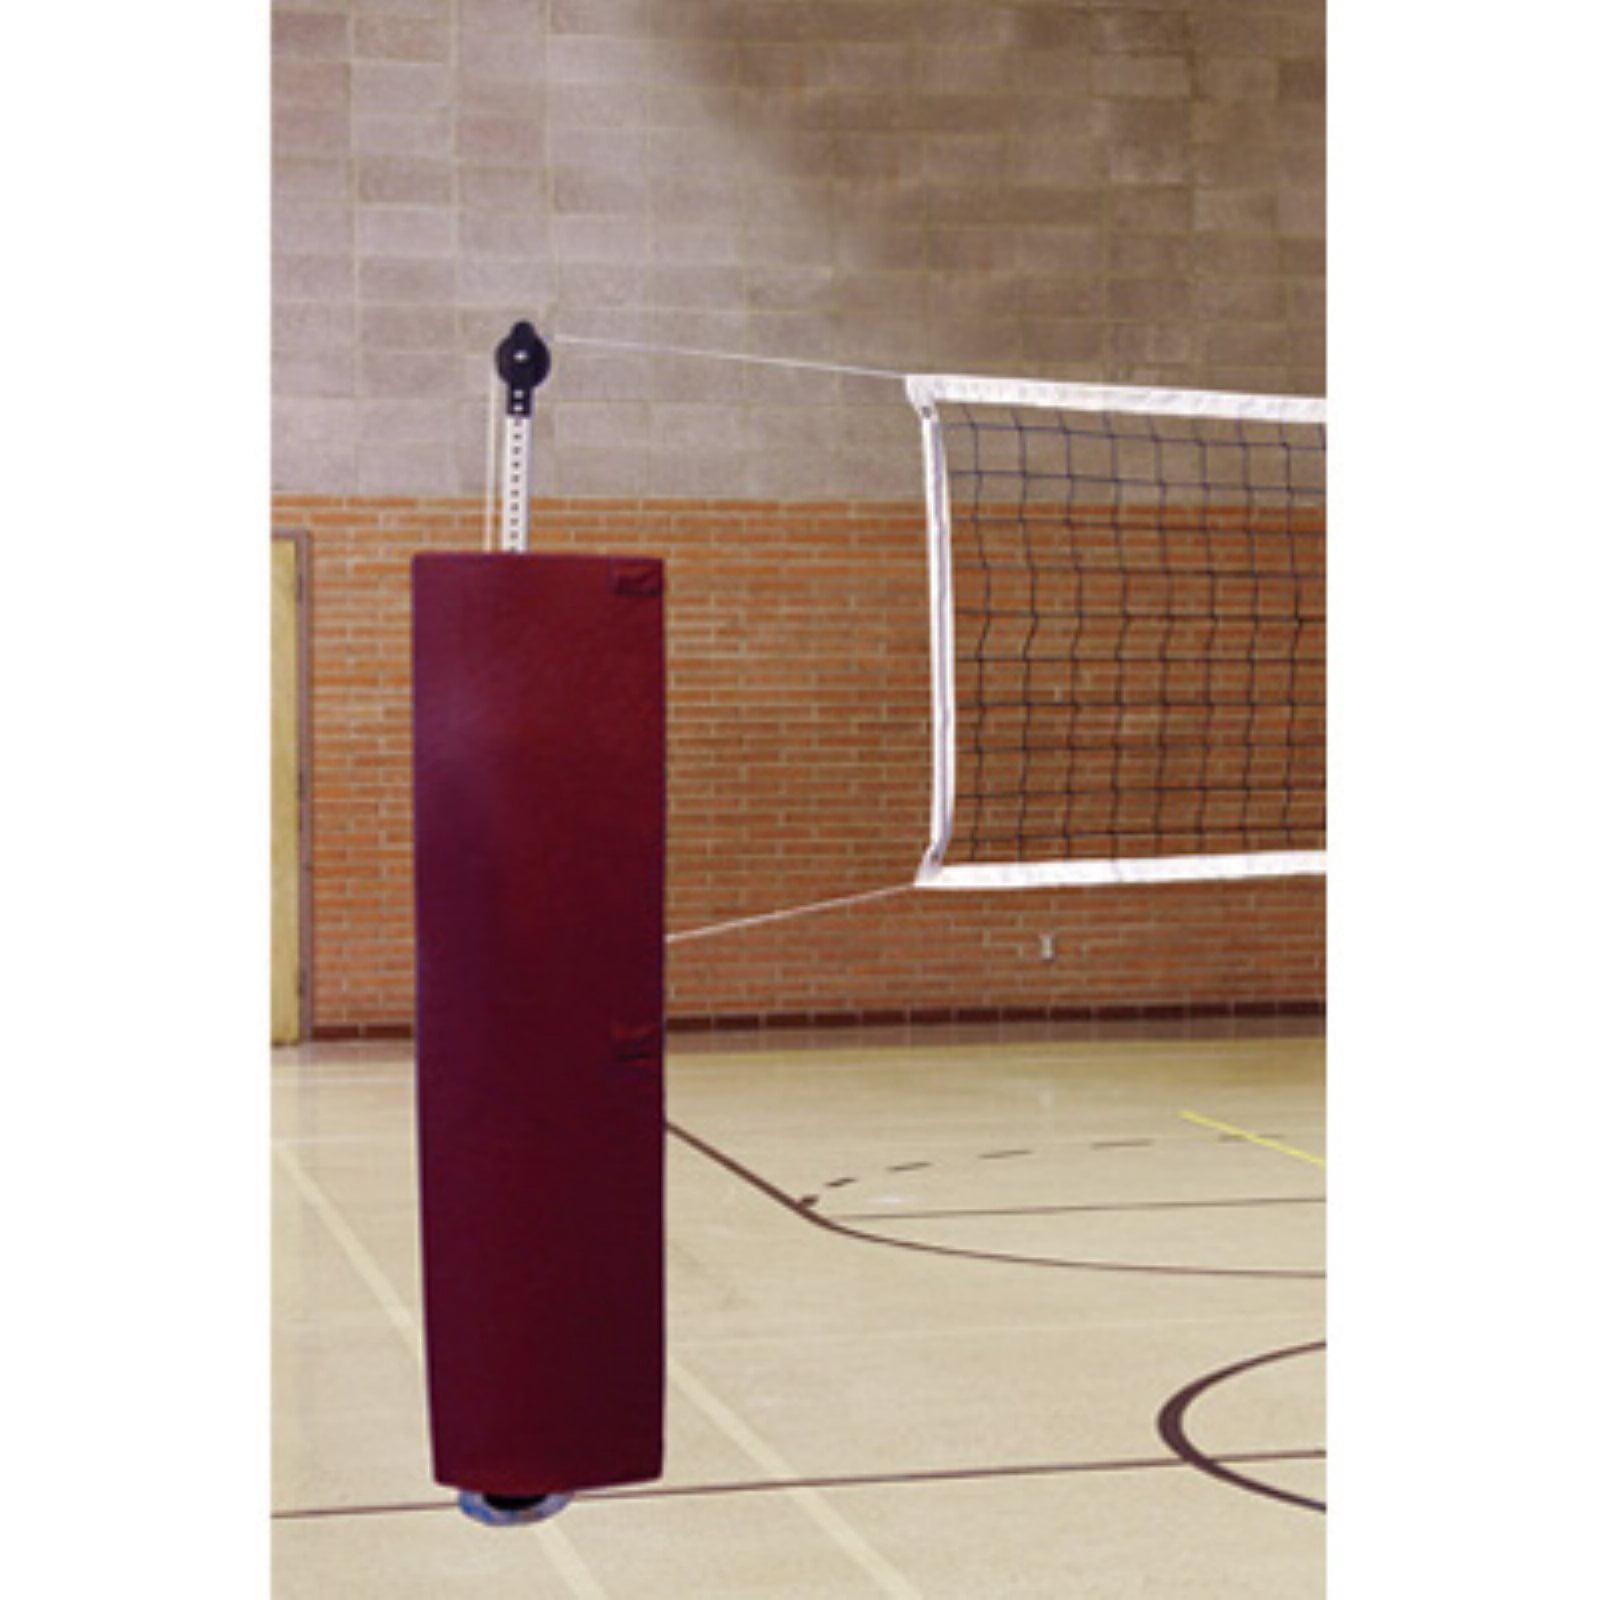 First Team QuickSet Steel Indoor Outdoor Volleyball Set by First Team Sports Inc